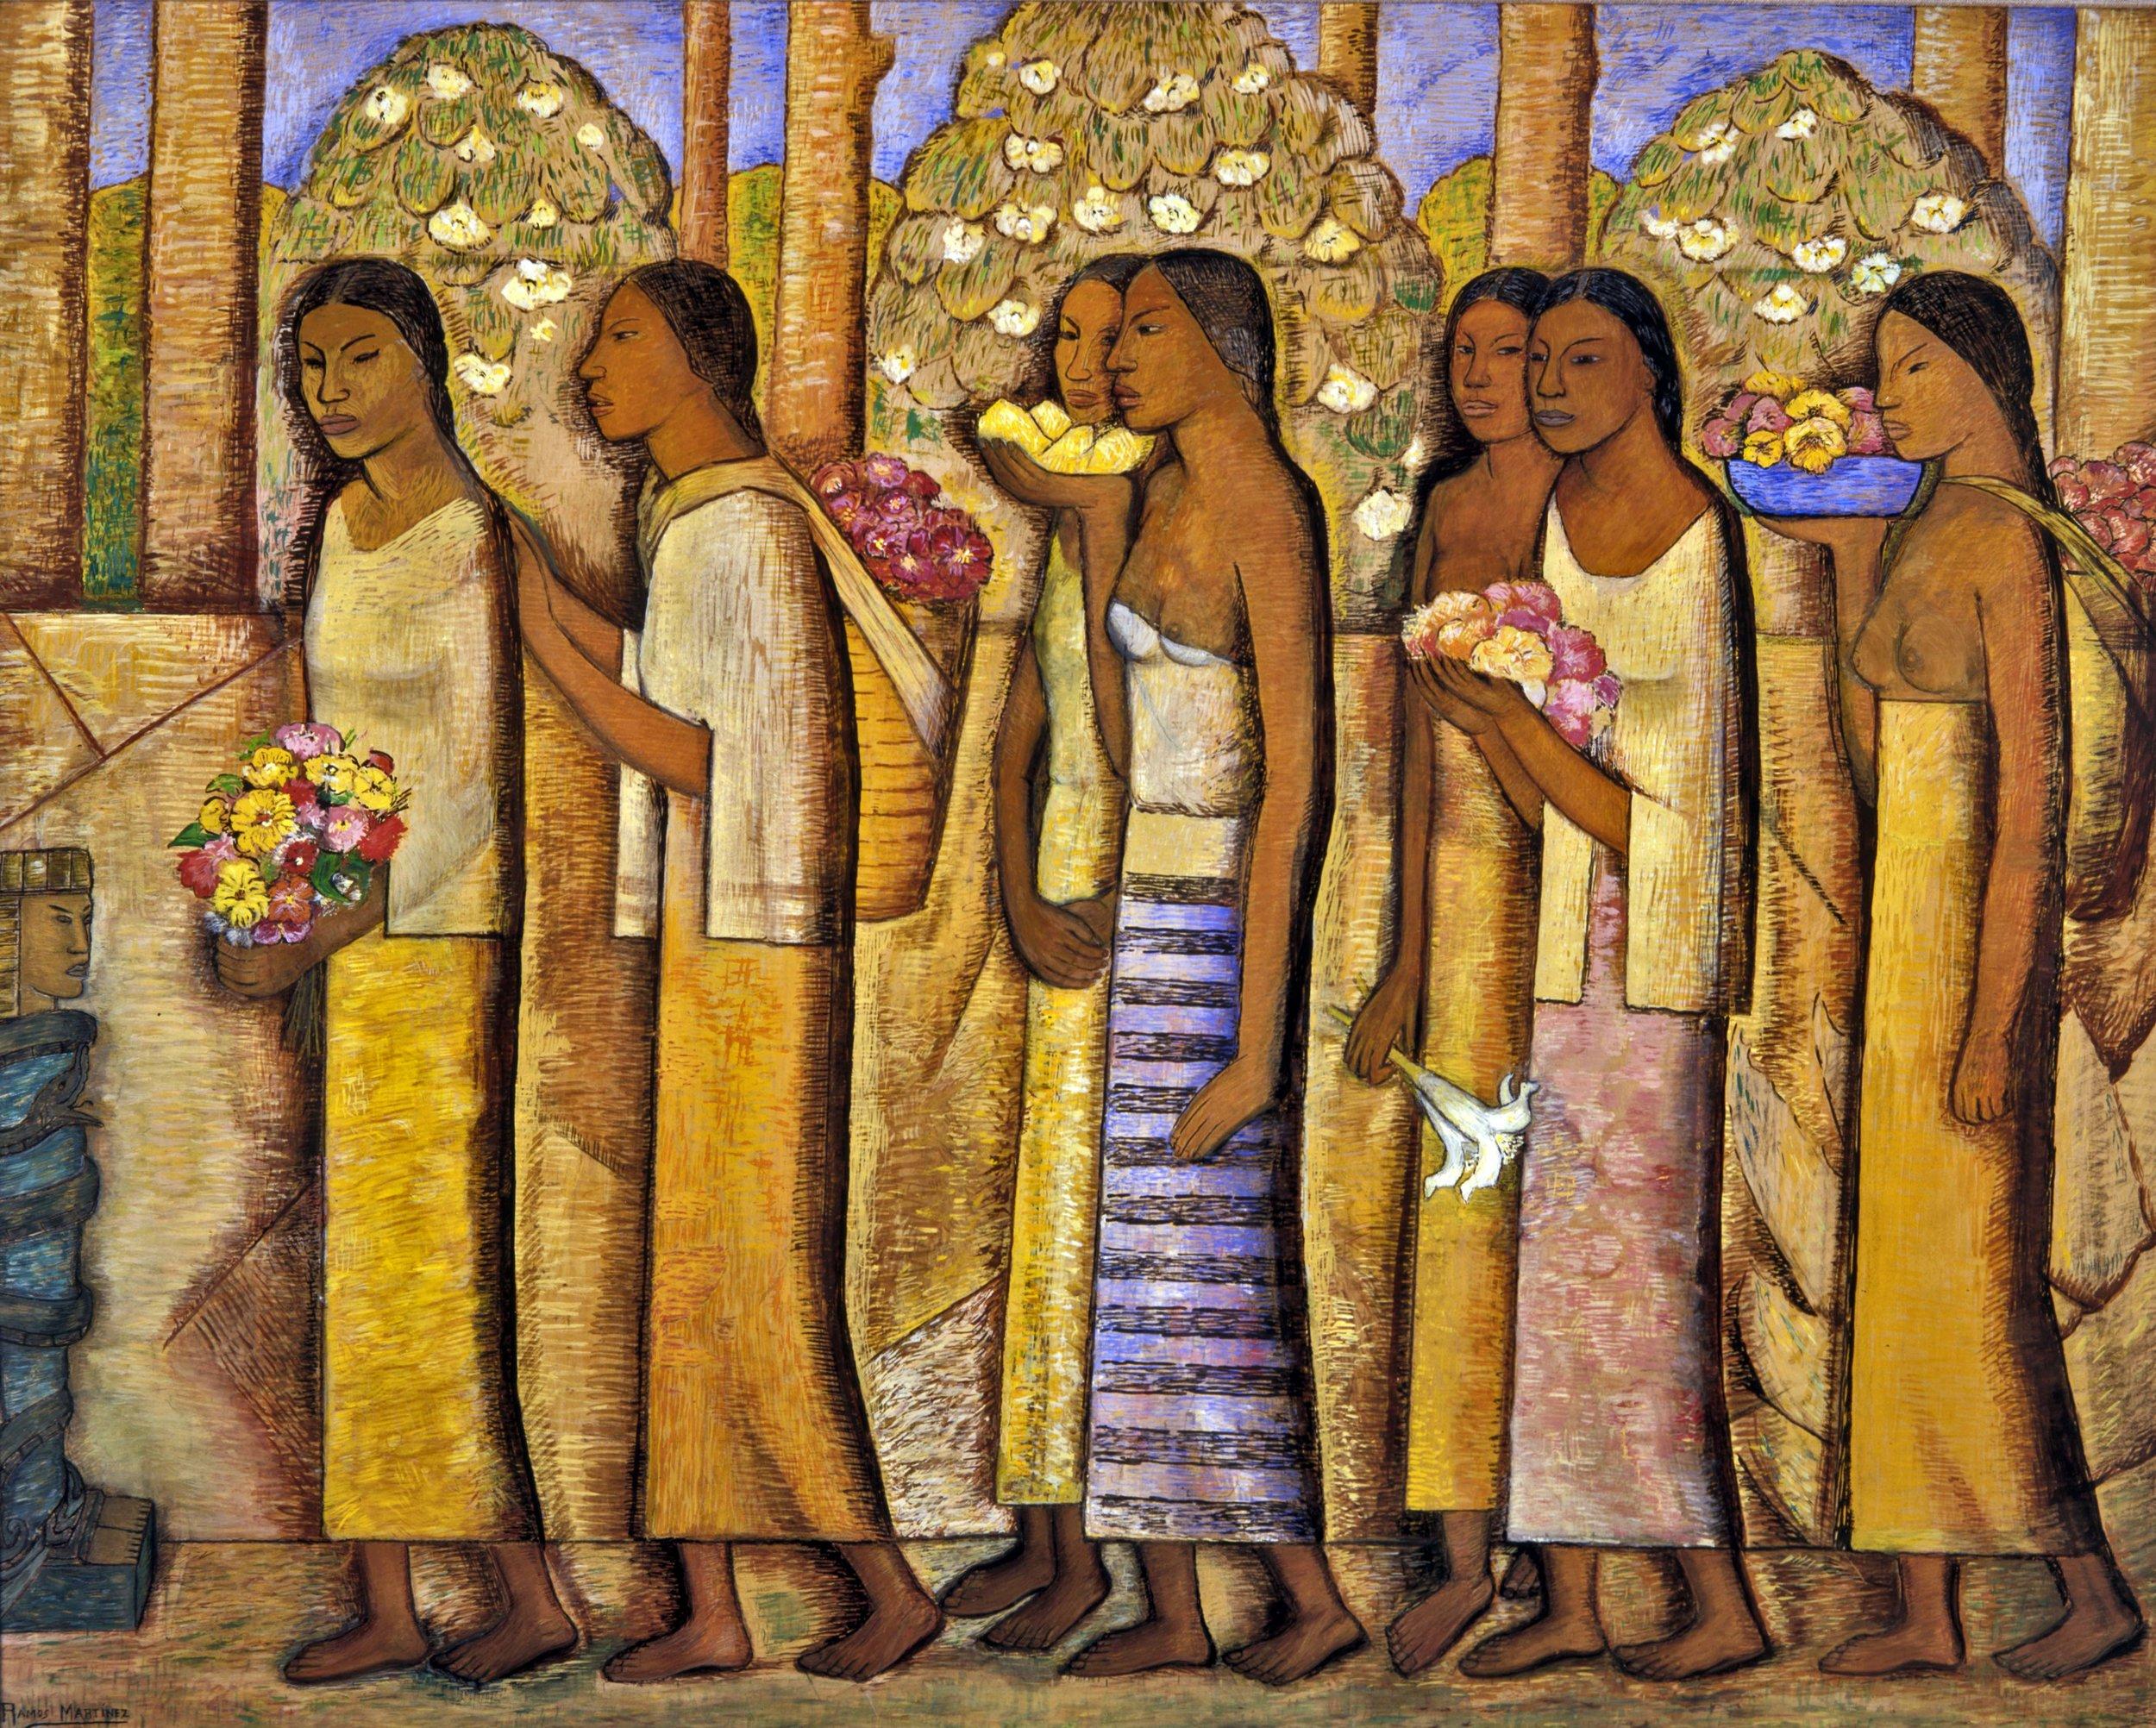 Homenaje a Quetzalcóatl / Homage to Quetzalcoatl  ca. 1940 tempera on paper / temple sobre papel 37 x 45 inches / 94 x 114.3 centímetros Private collection